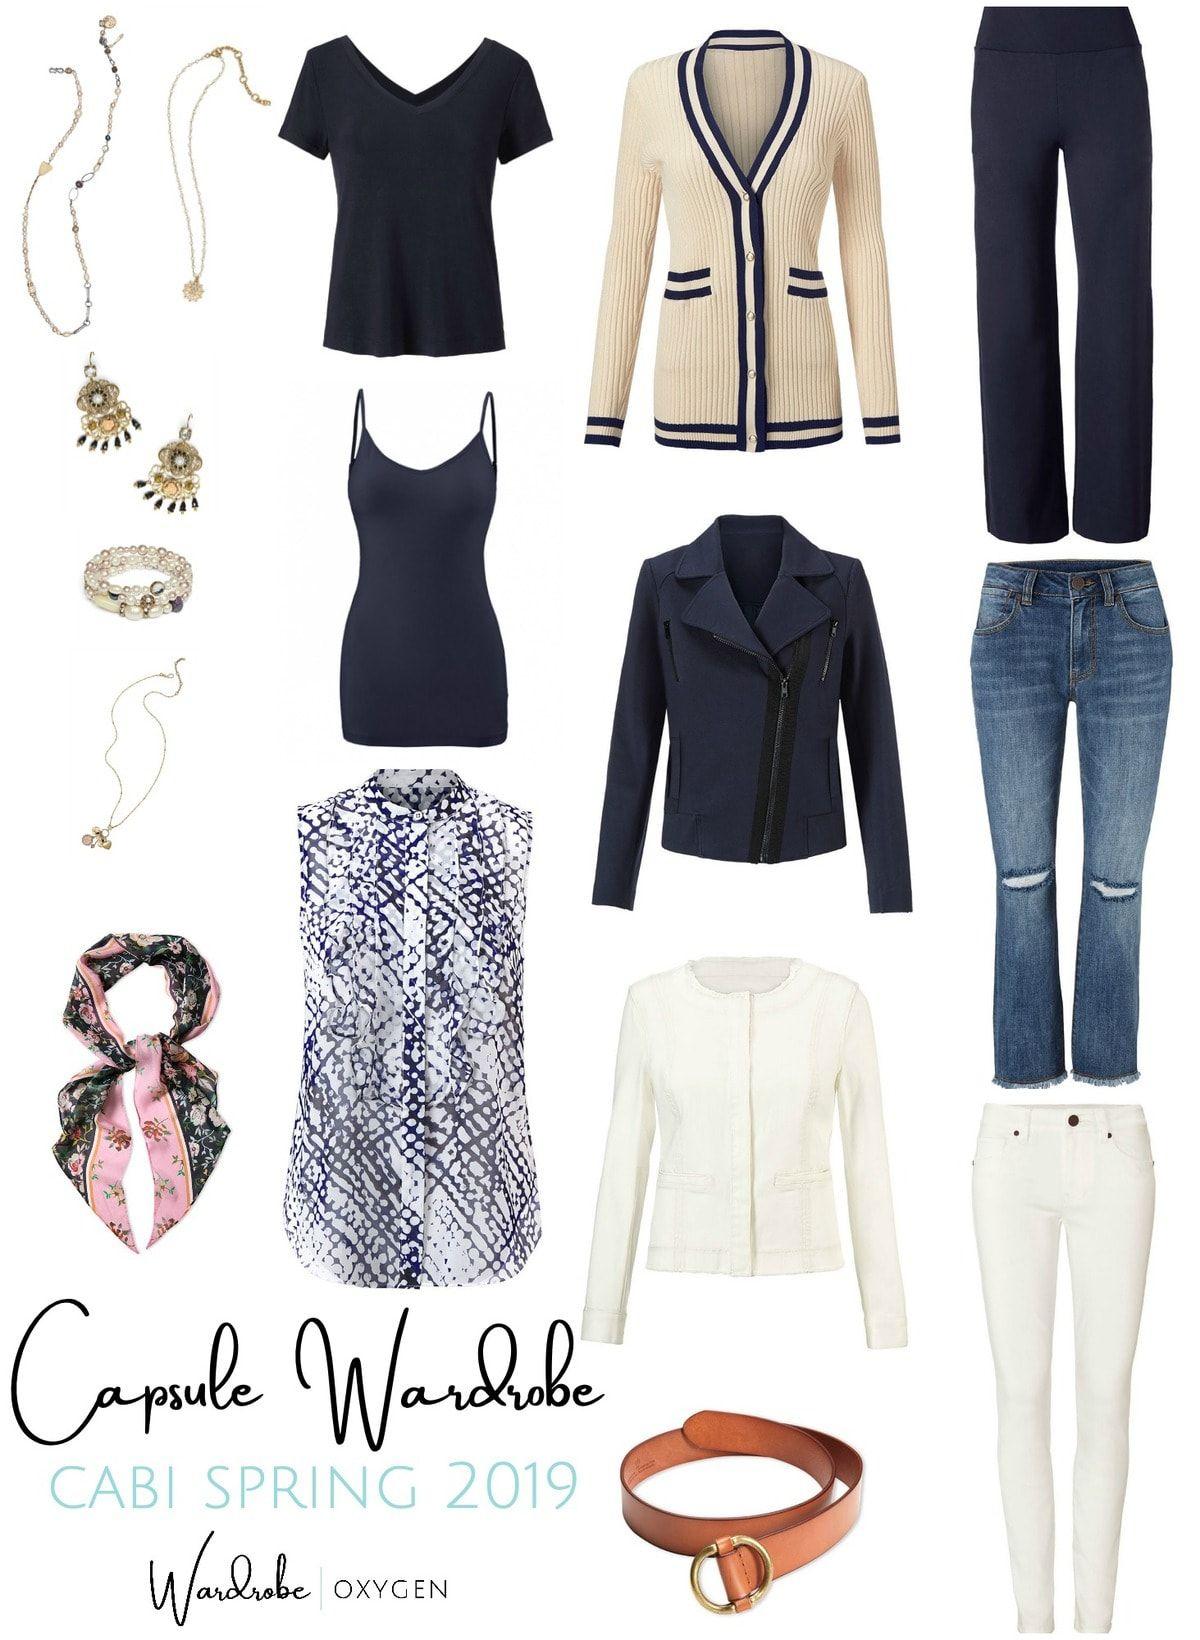 A Spring cabi Capsule Wardrobe | Wardrobe Oxygen